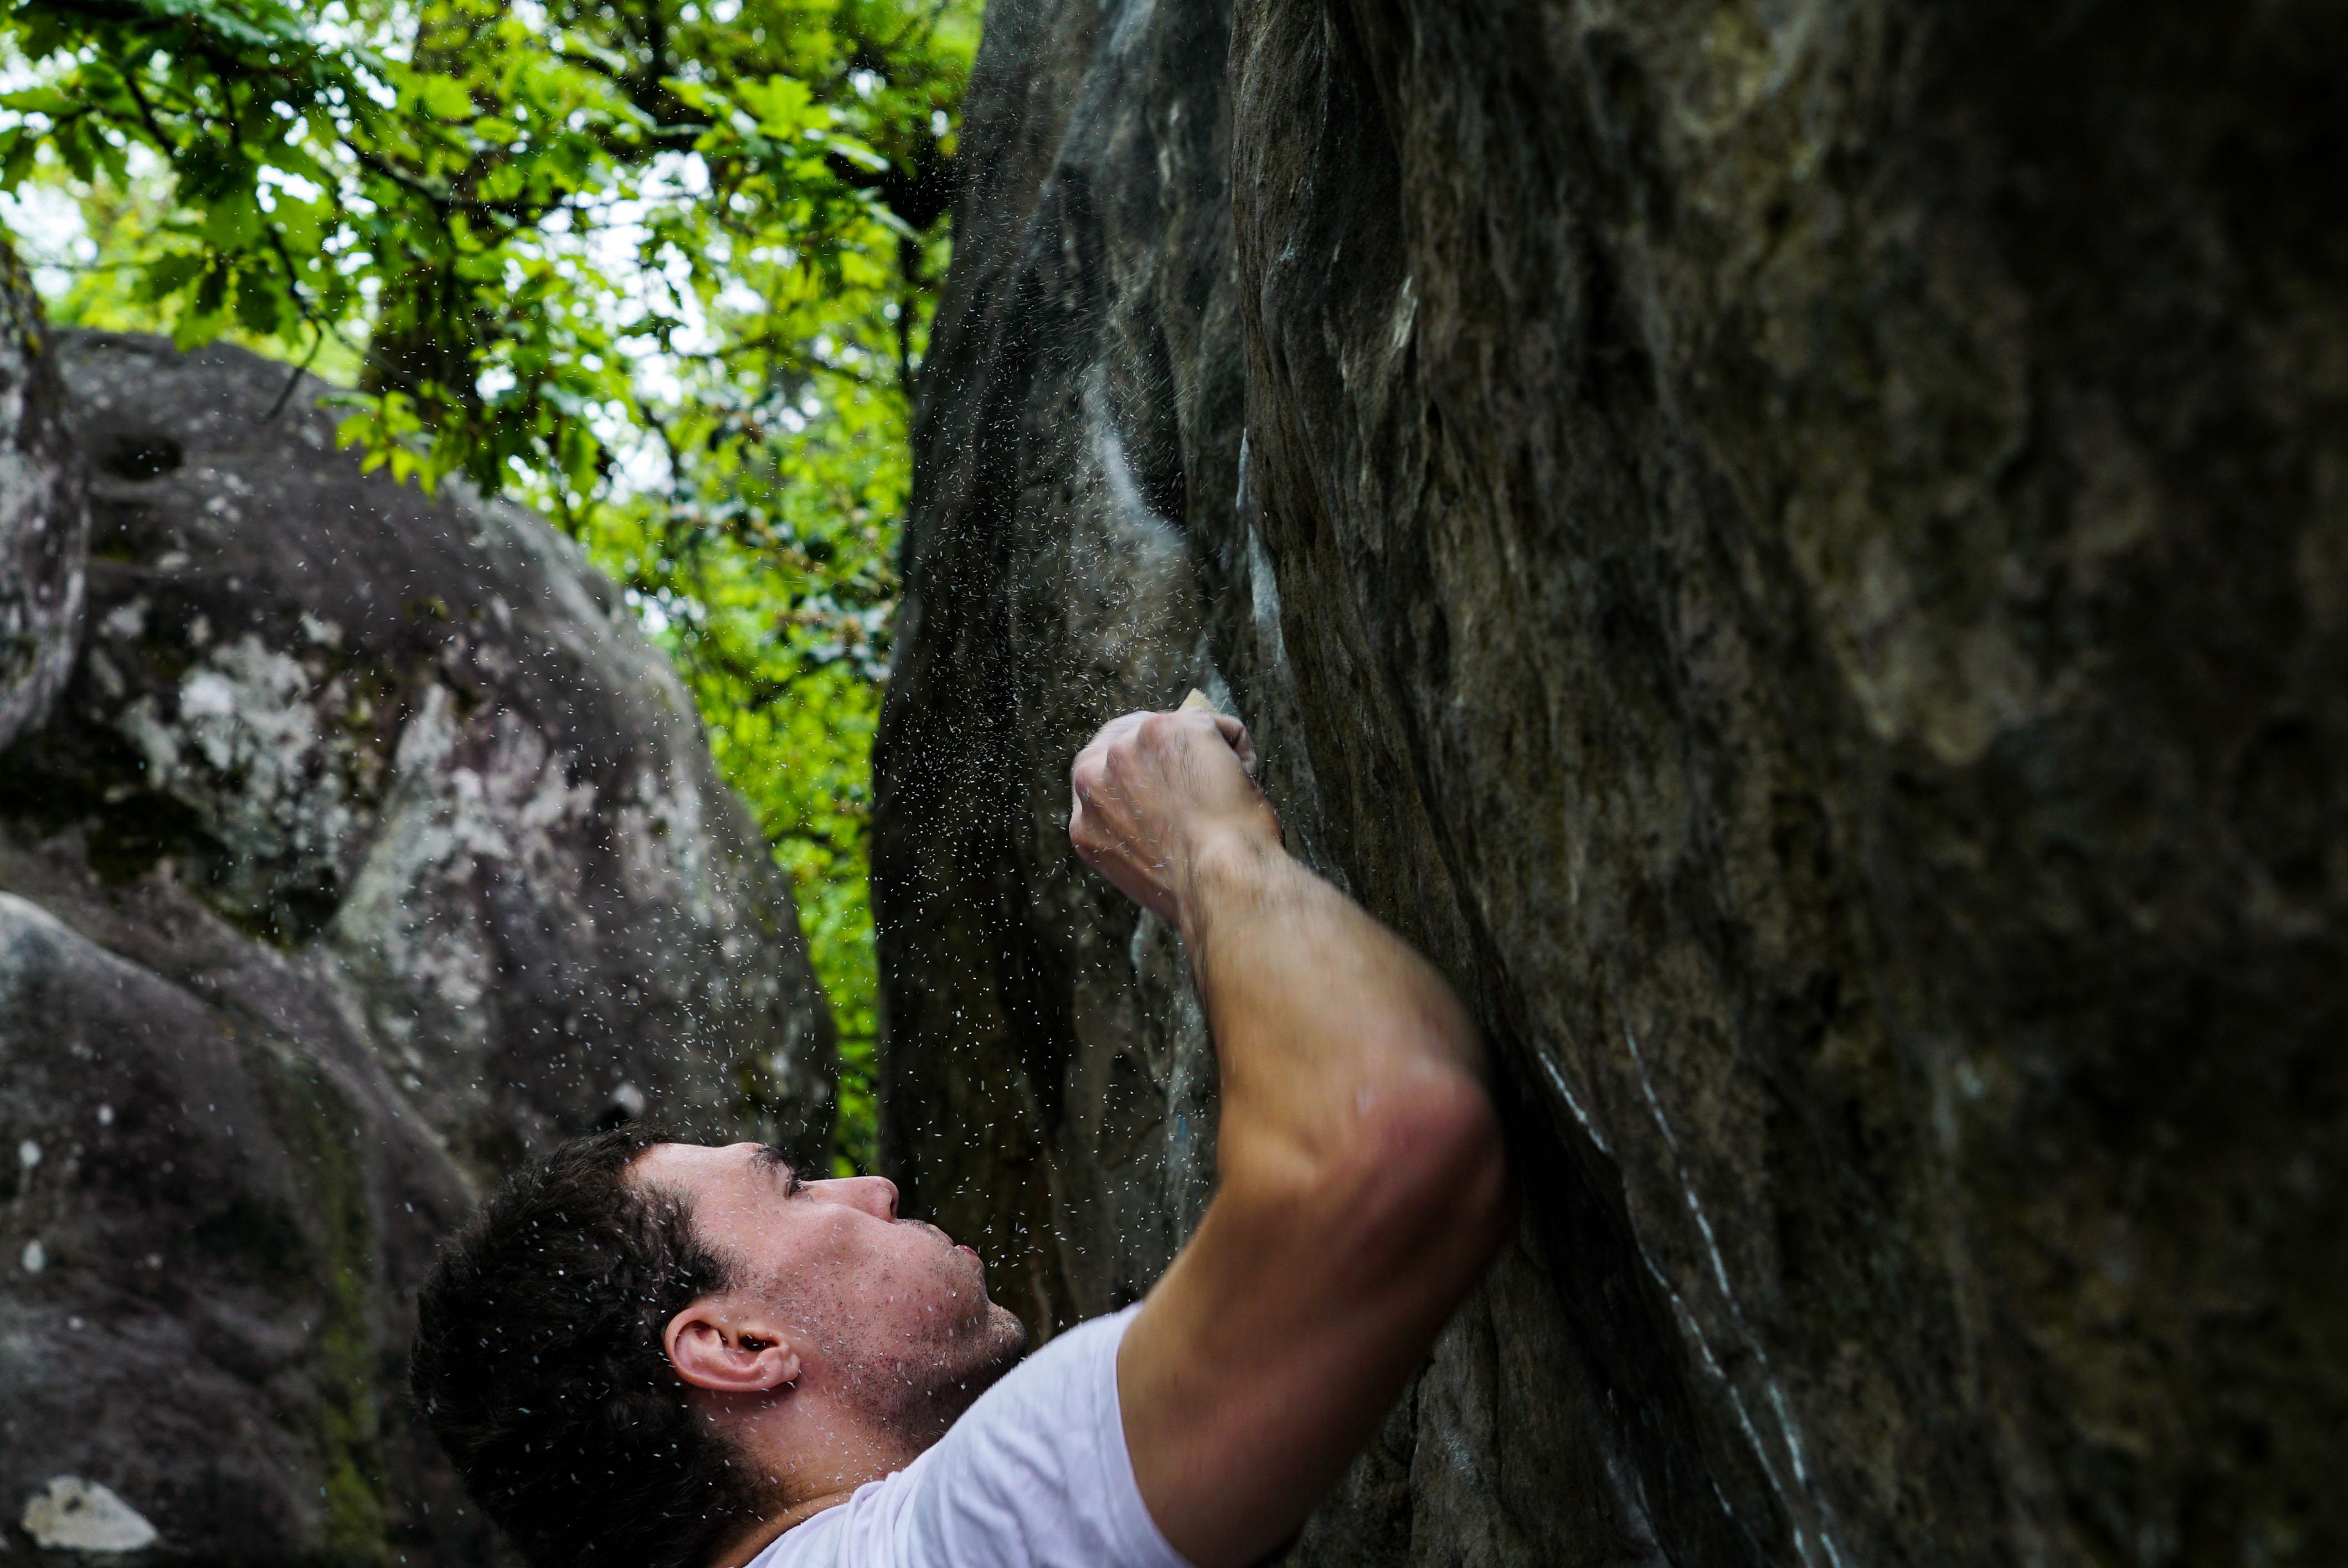 fontainbleau climbing 2016 mike brindley-38